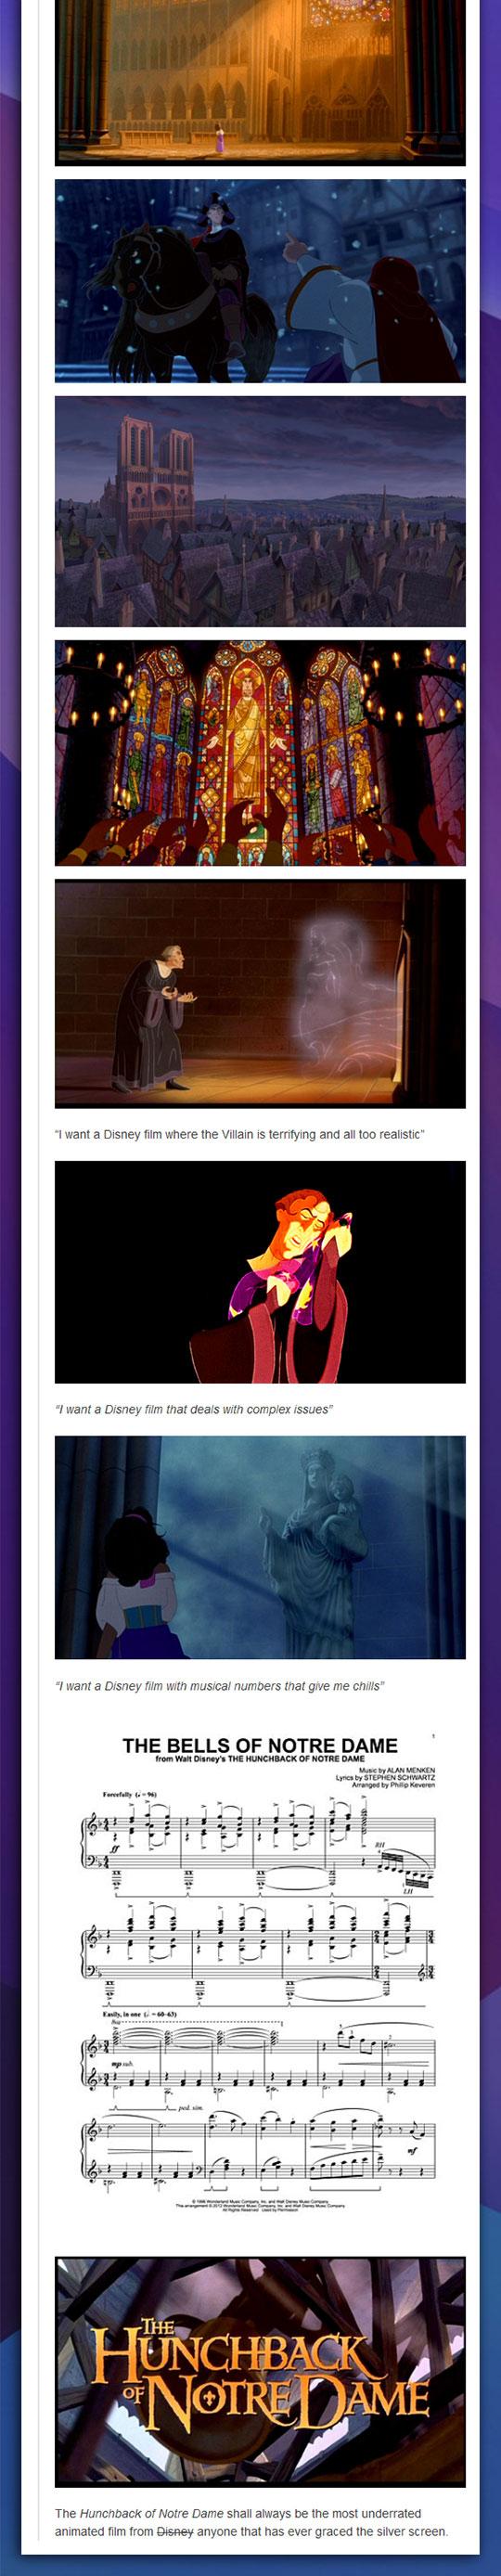 cool-Disney-story-Notre-Dam-sad